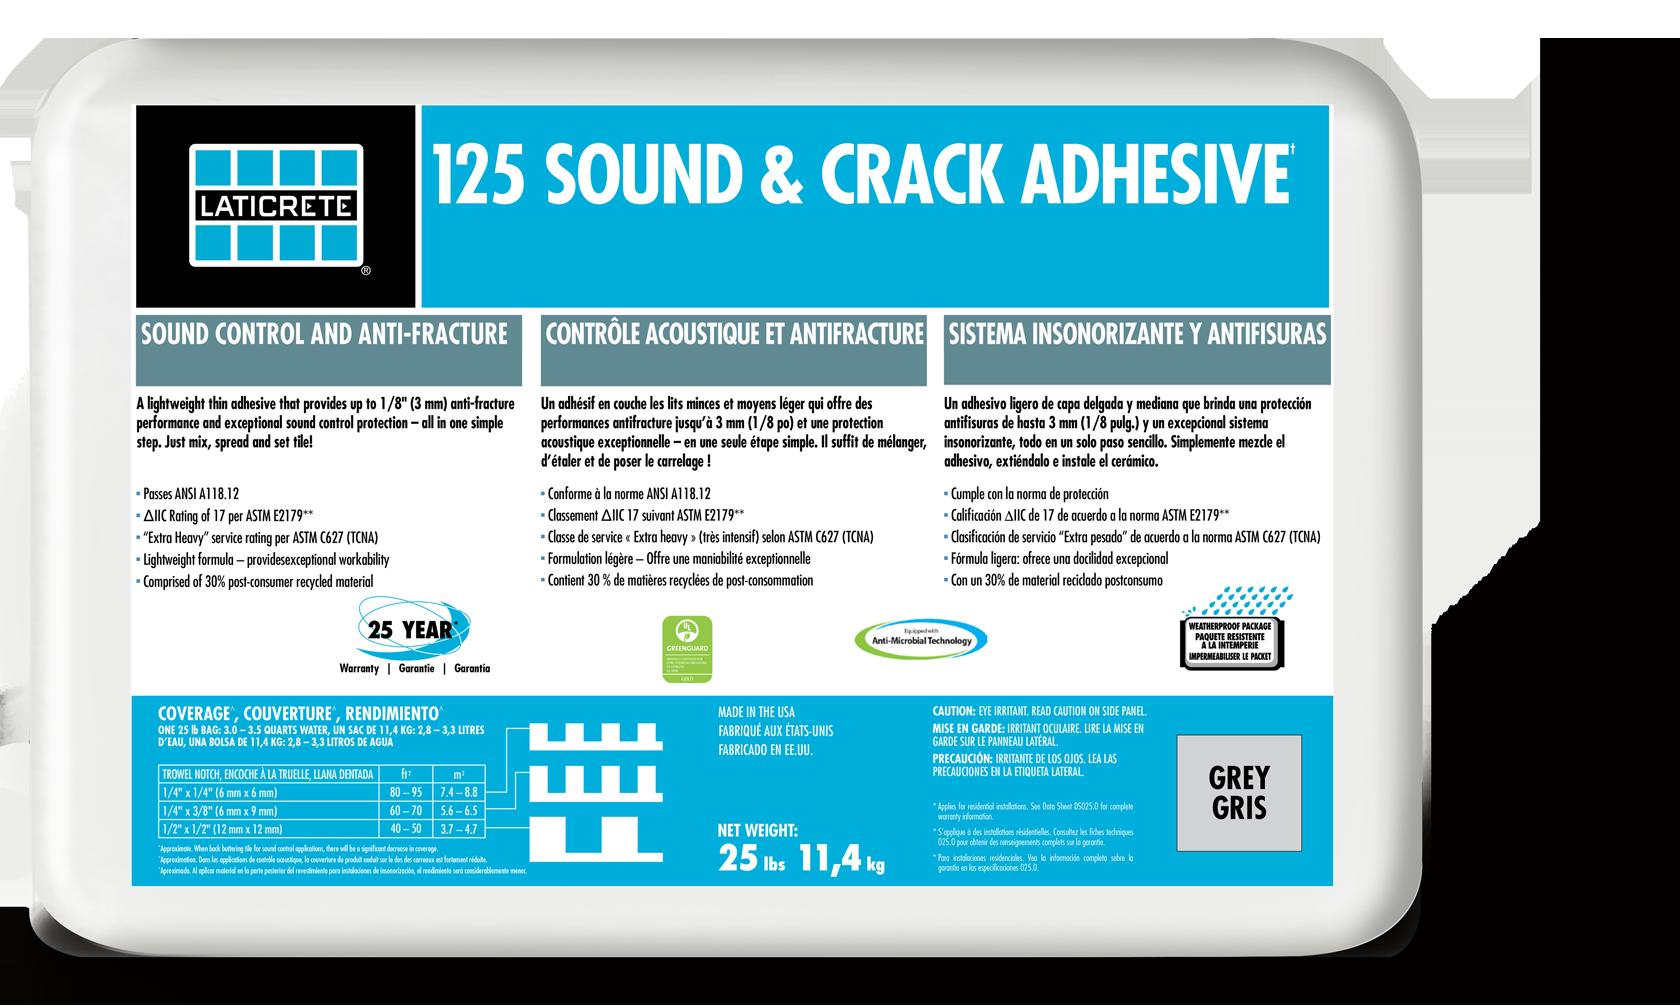 125 Sound & Crack Adhesive